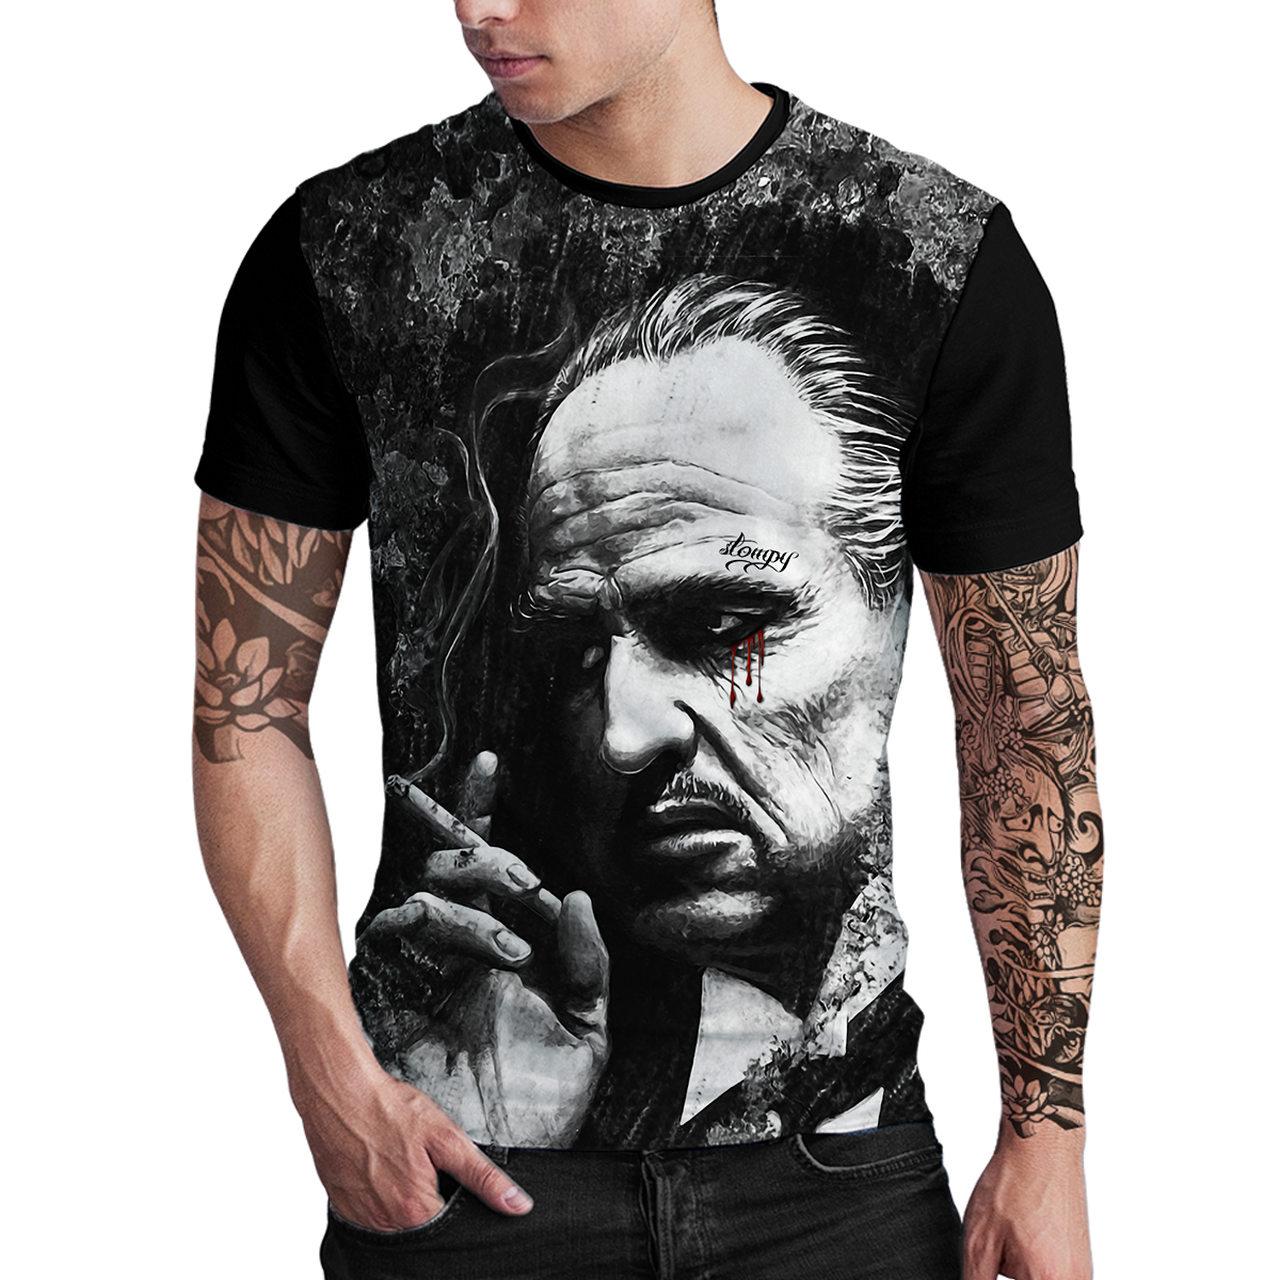 Stompy Camiseta Estampada Masculina Modelo 28